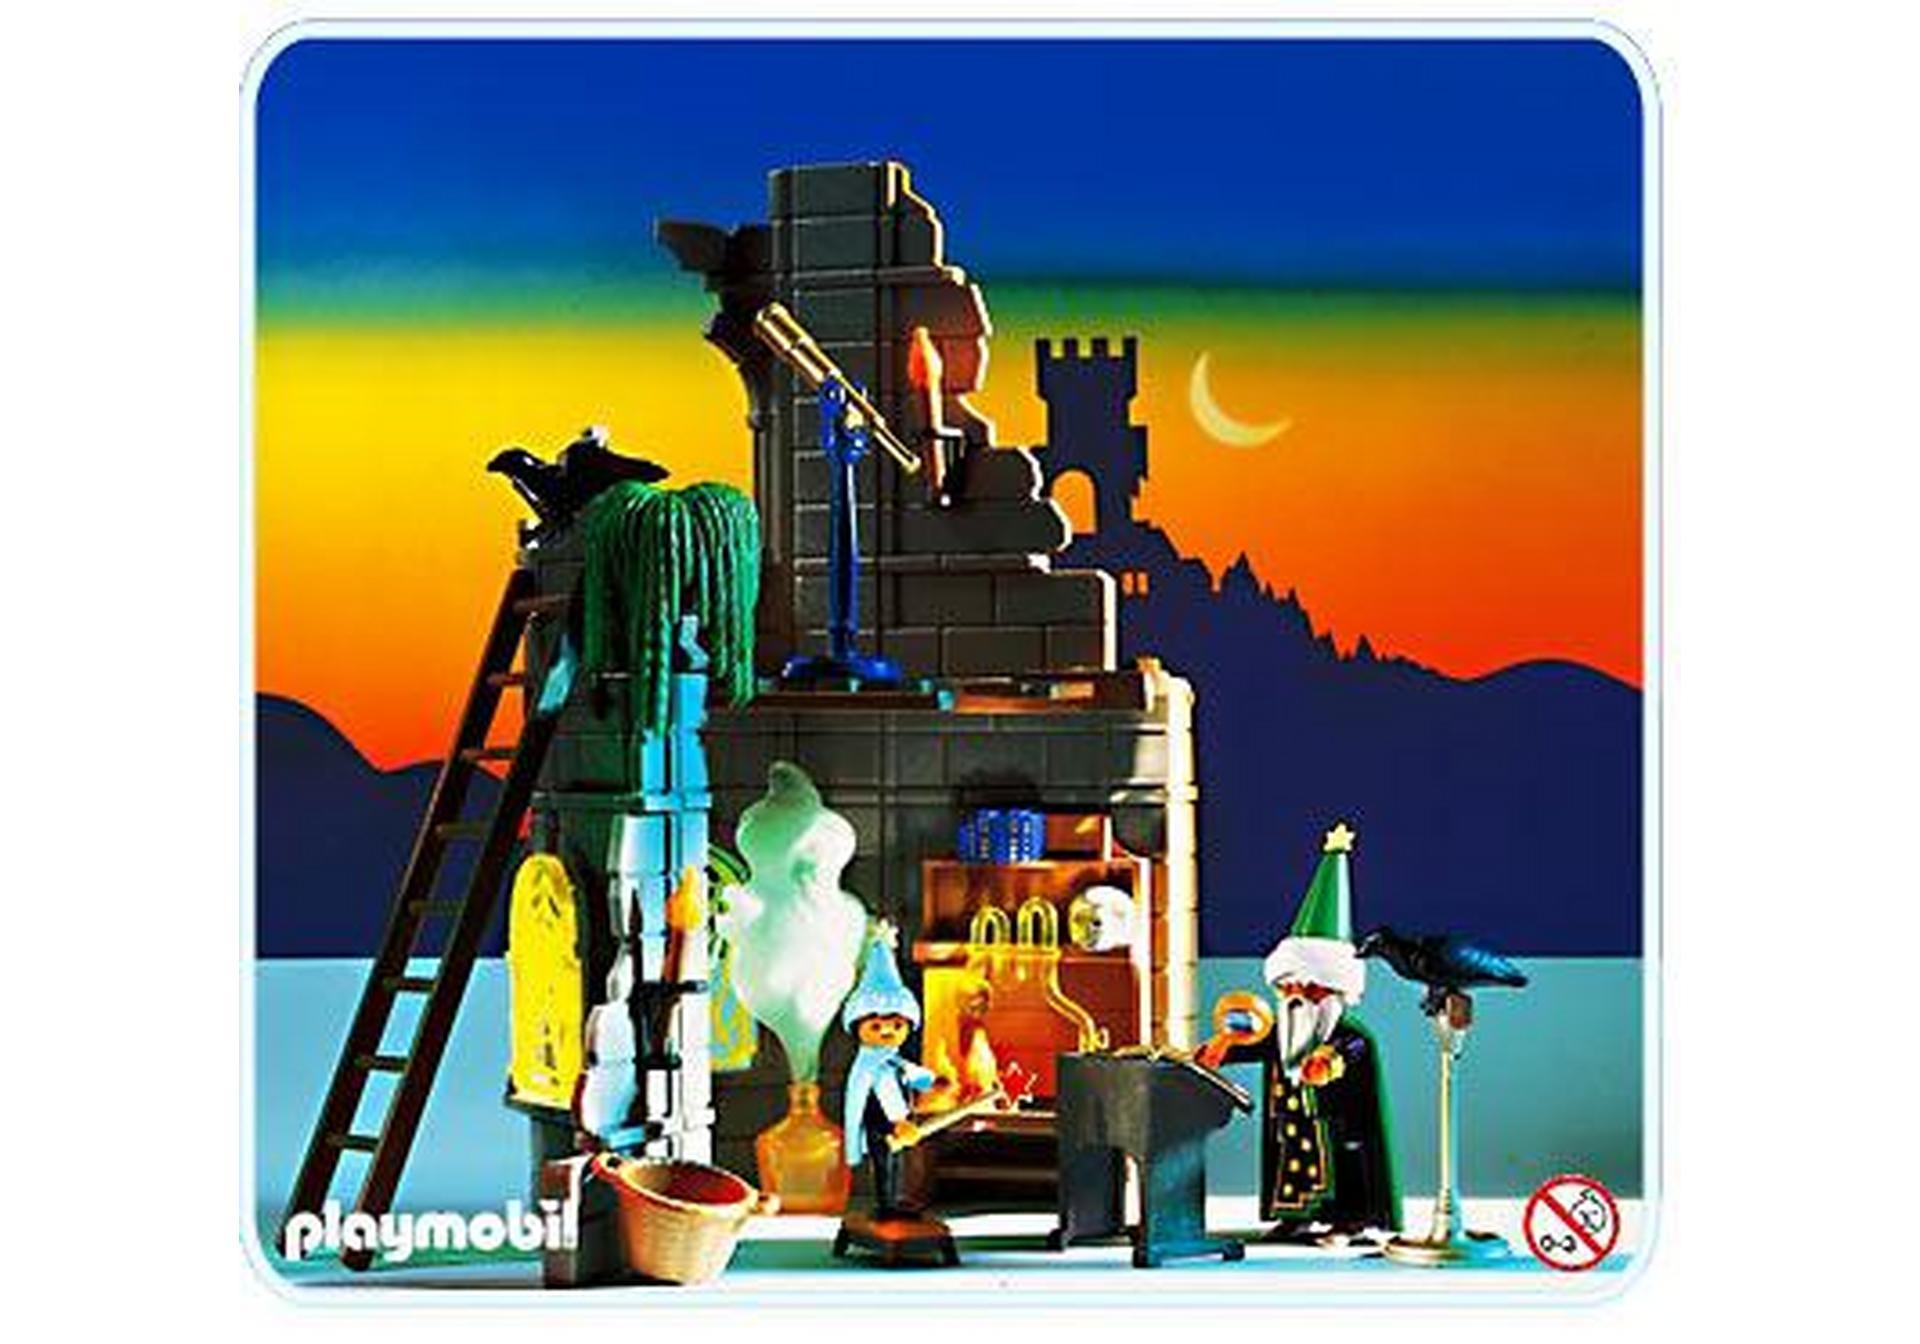 Magierwerkstatt 3839 a playmobil deutschland for Jugendzimmer playmobil